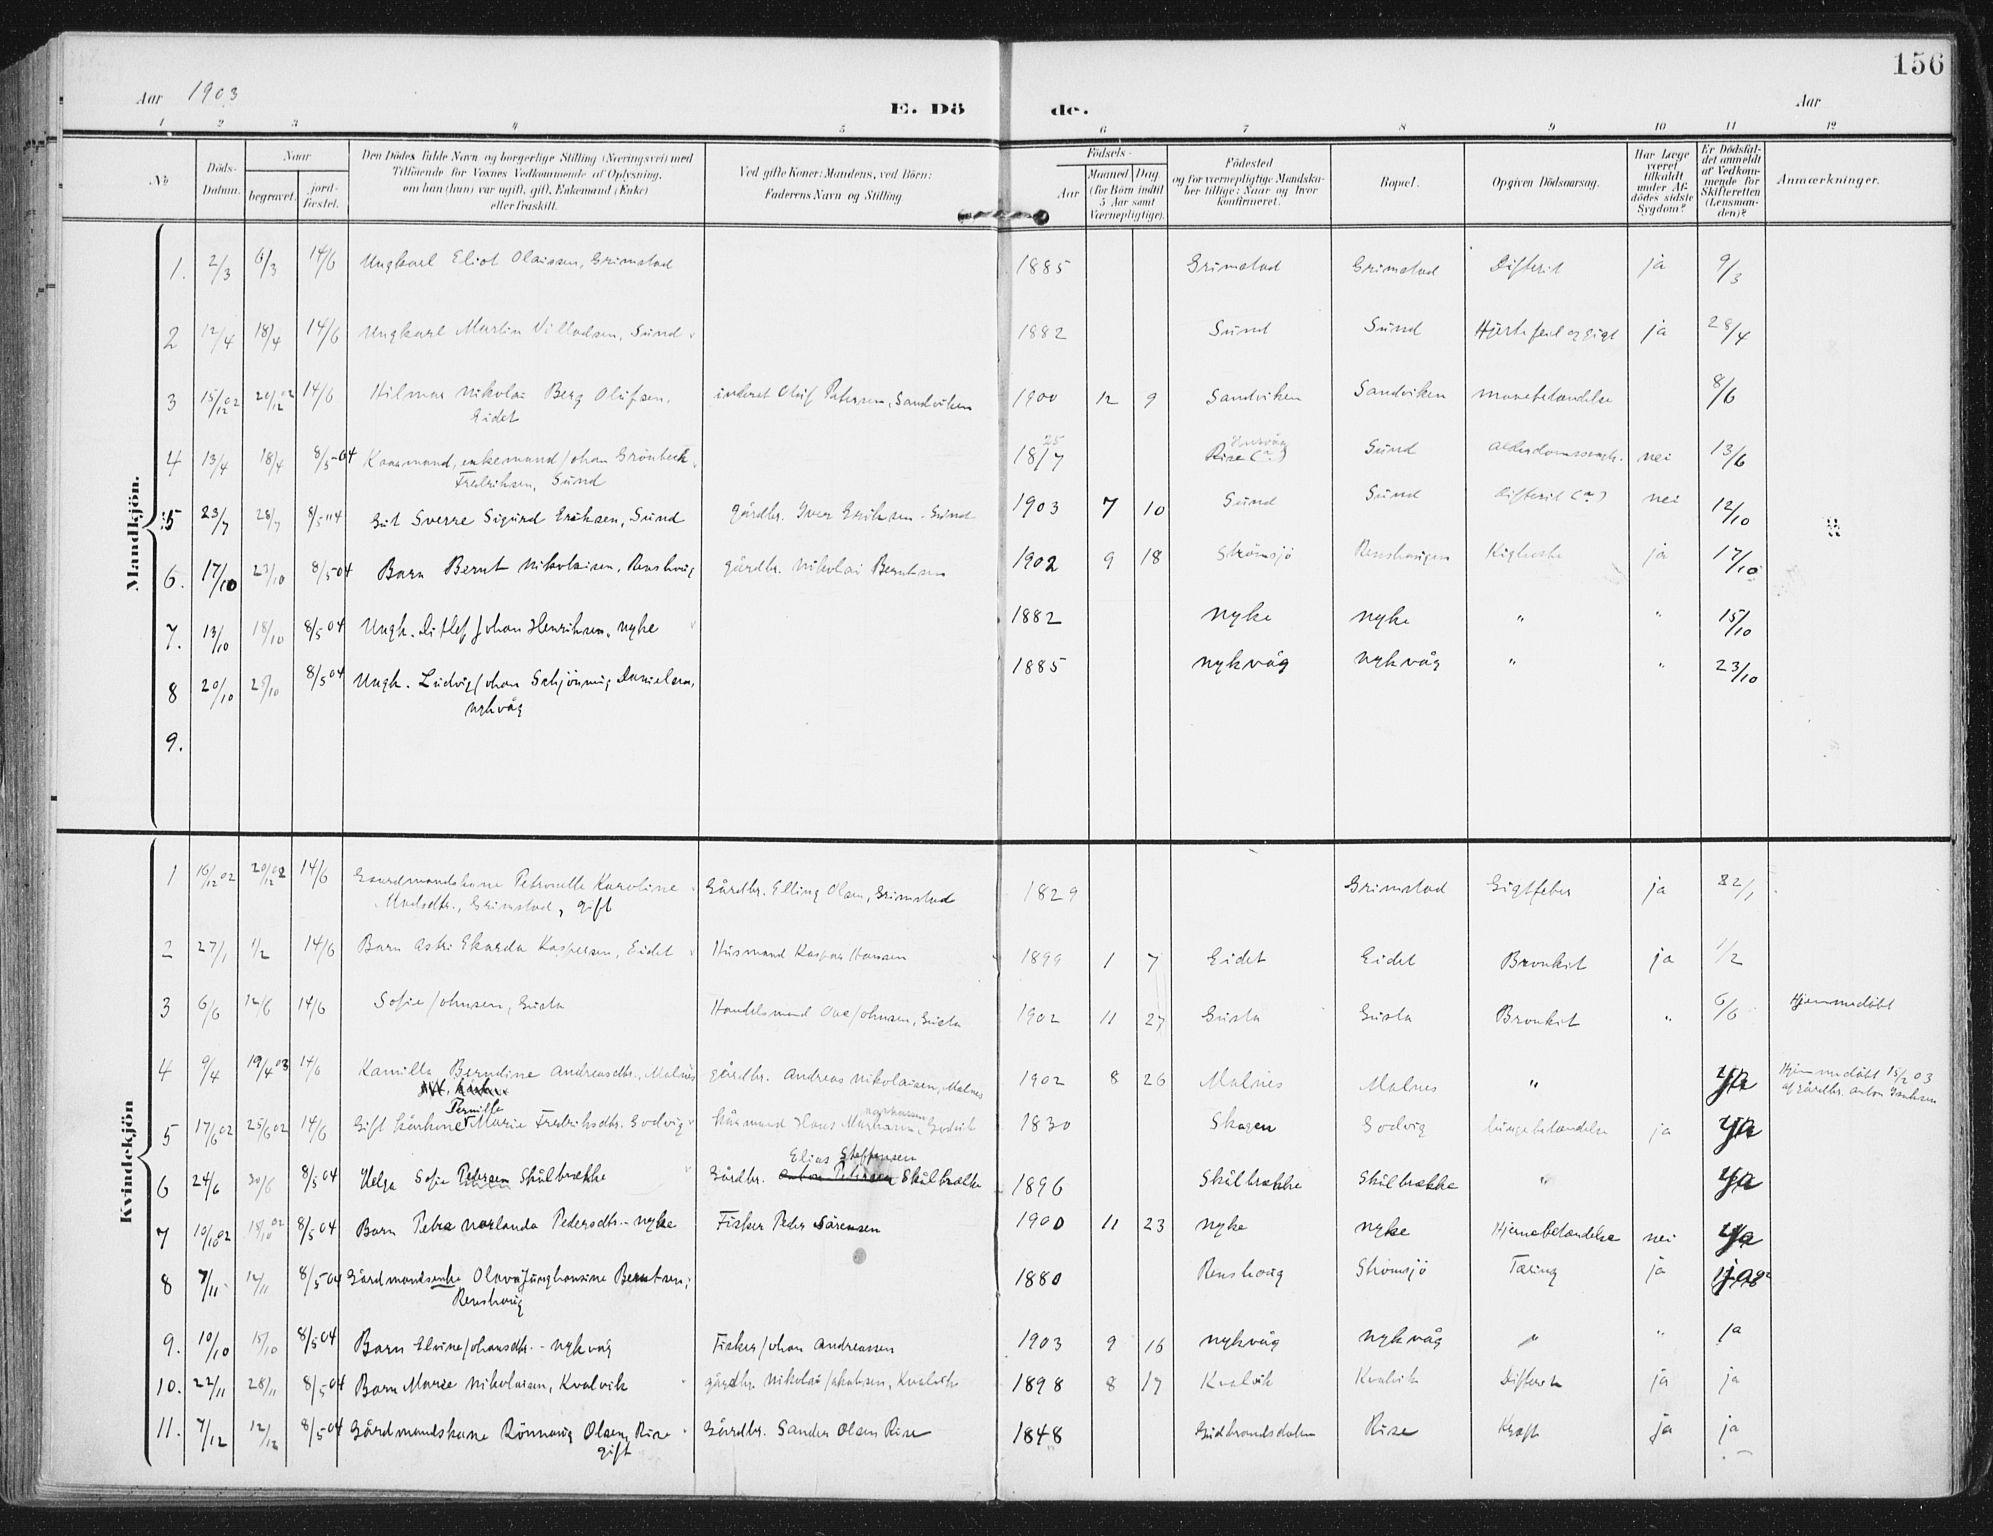 SAT, Ministerialprotokoller, klokkerbøker og fødselsregistre - Nordland, 892/L1321: Ministerialbok nr. 892A02, 1902-1918, s. 156